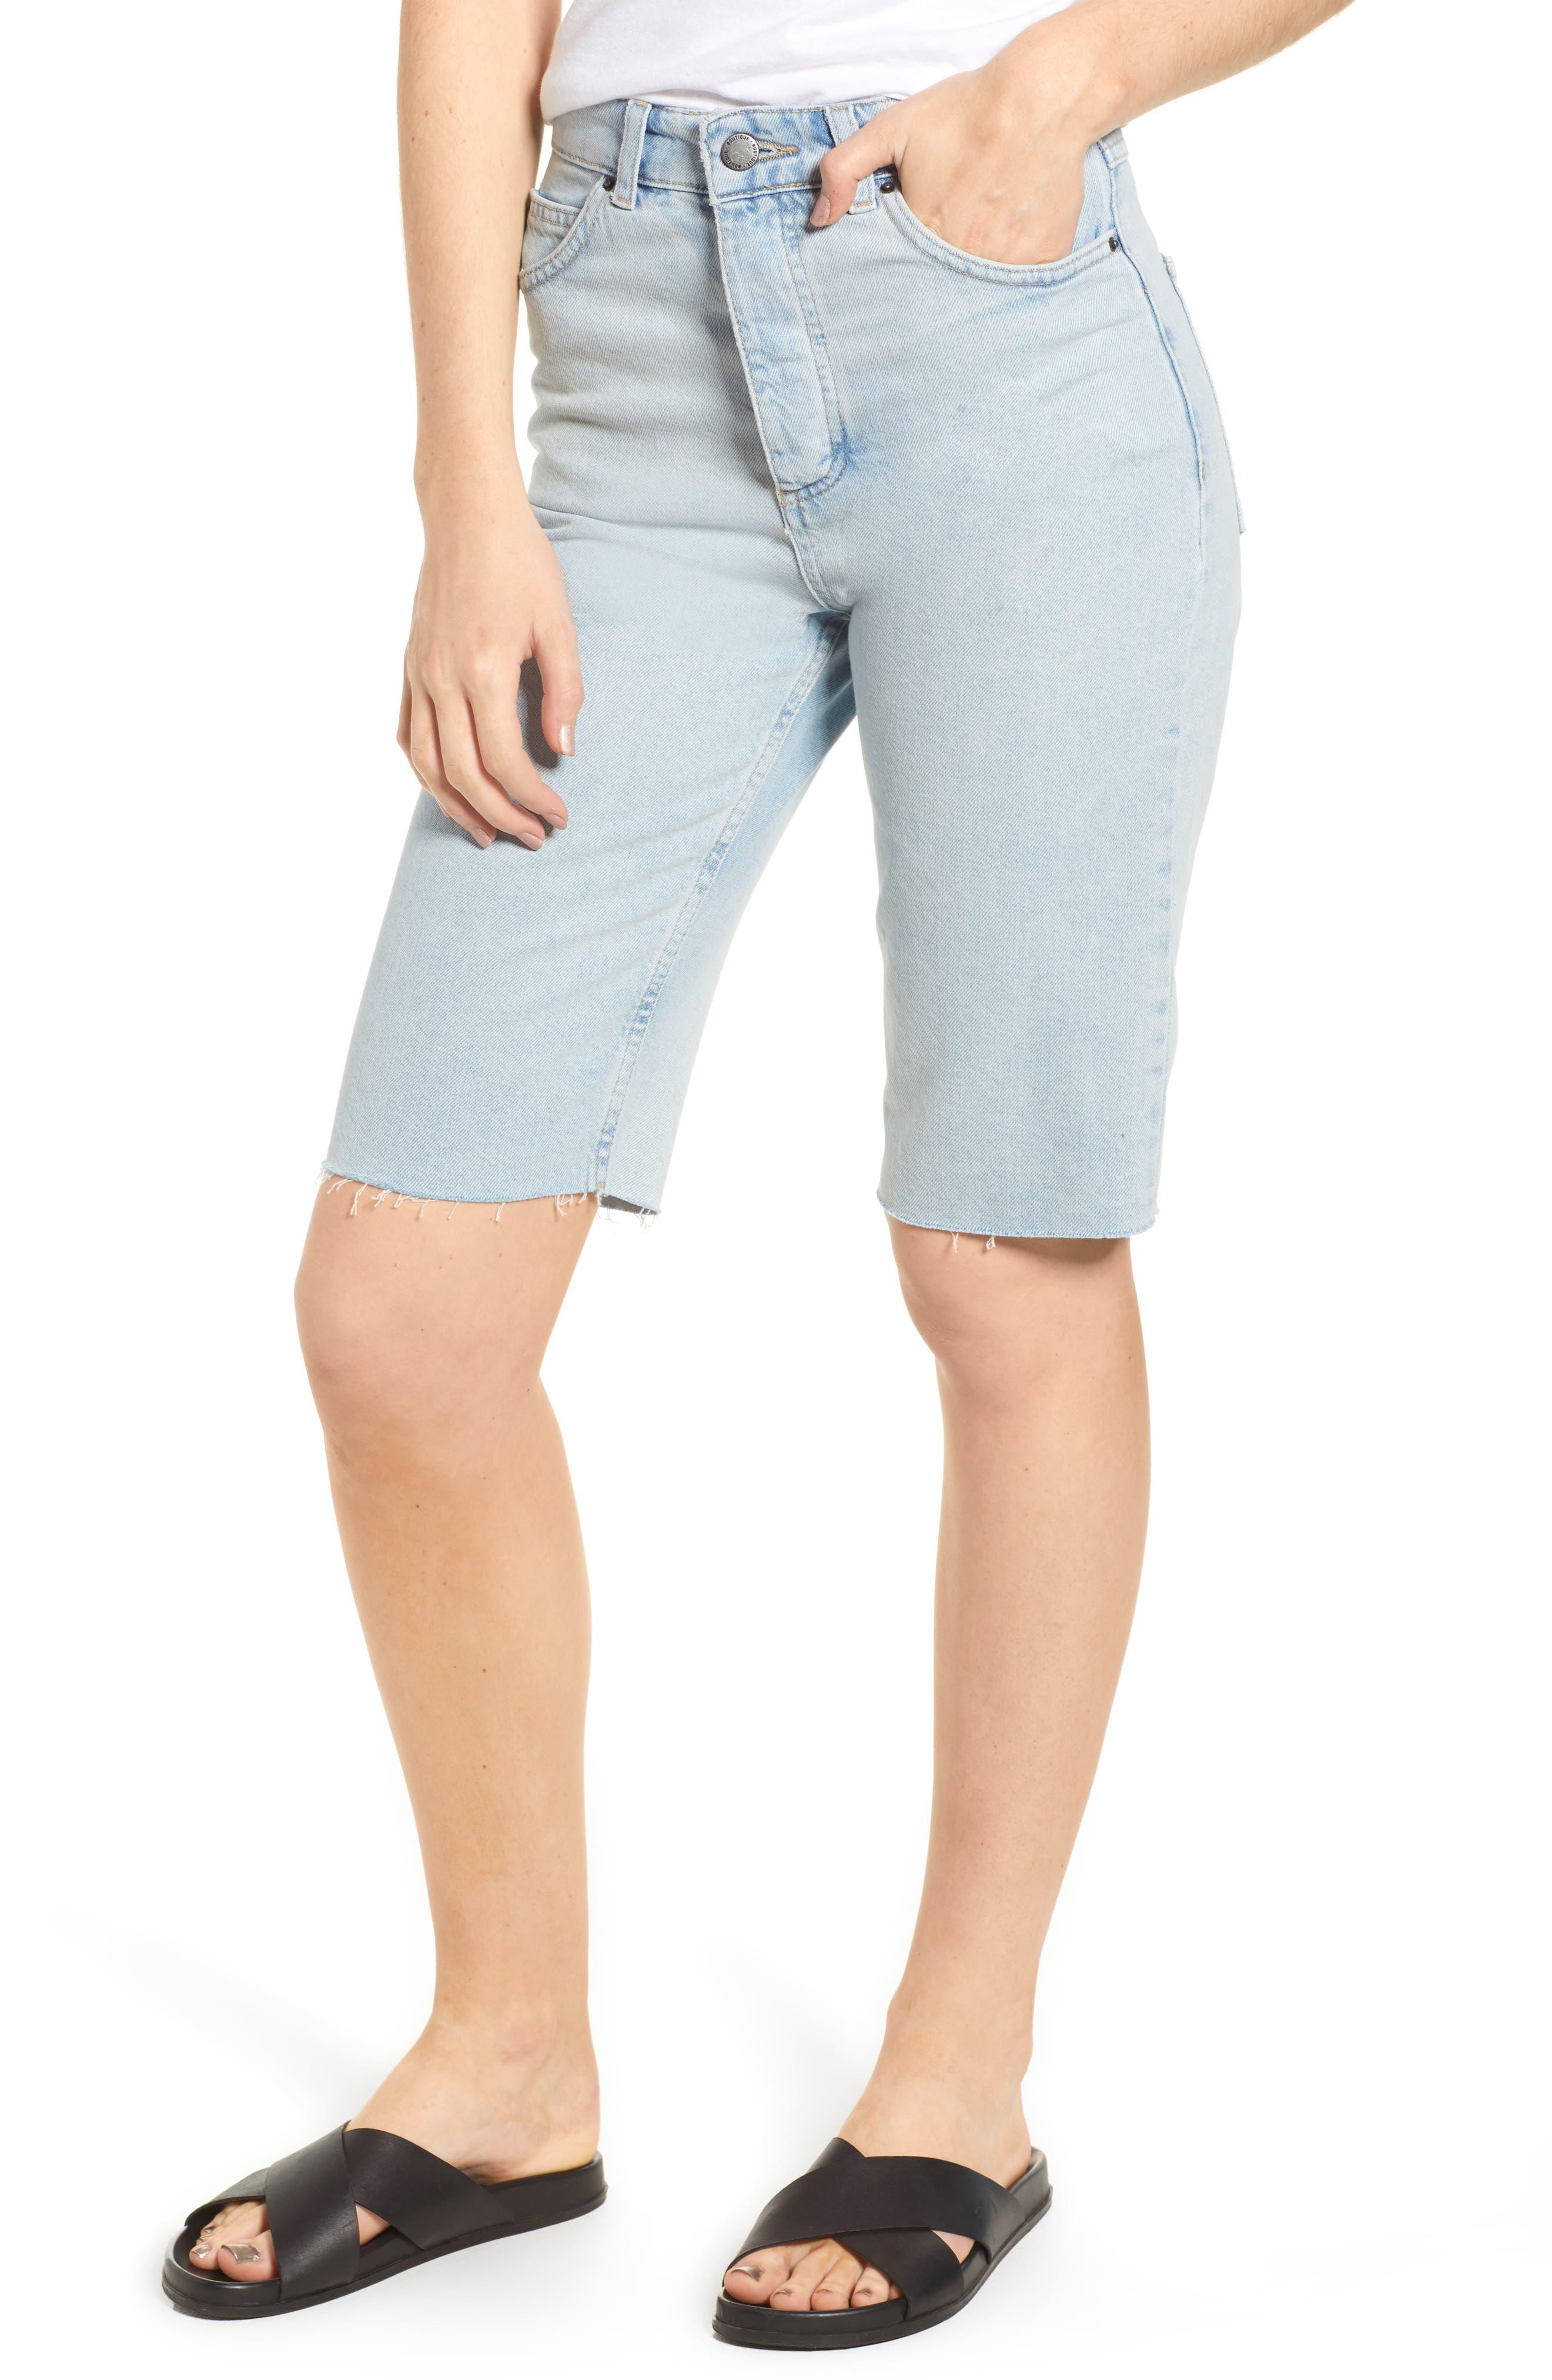 Bleach Denim Board Shorts,                         Main,                         color, 420